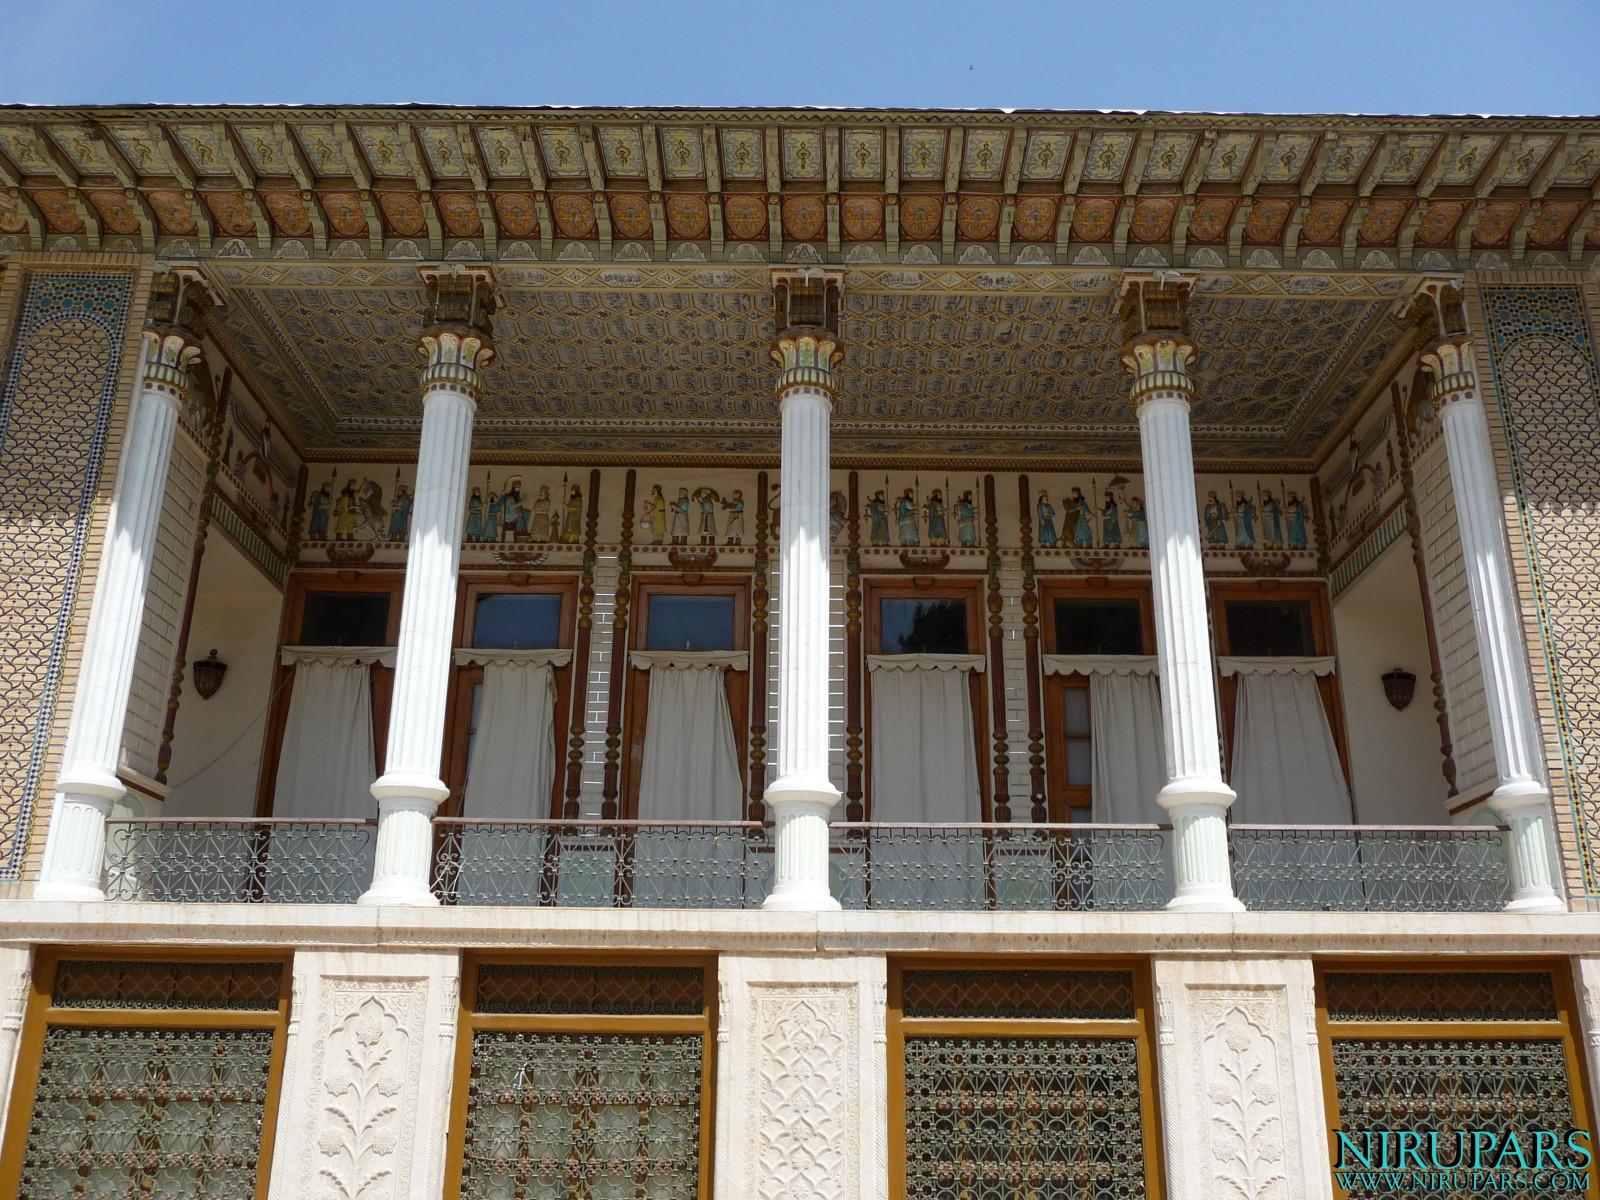 Baq-e Afifabad - Building - Balcony